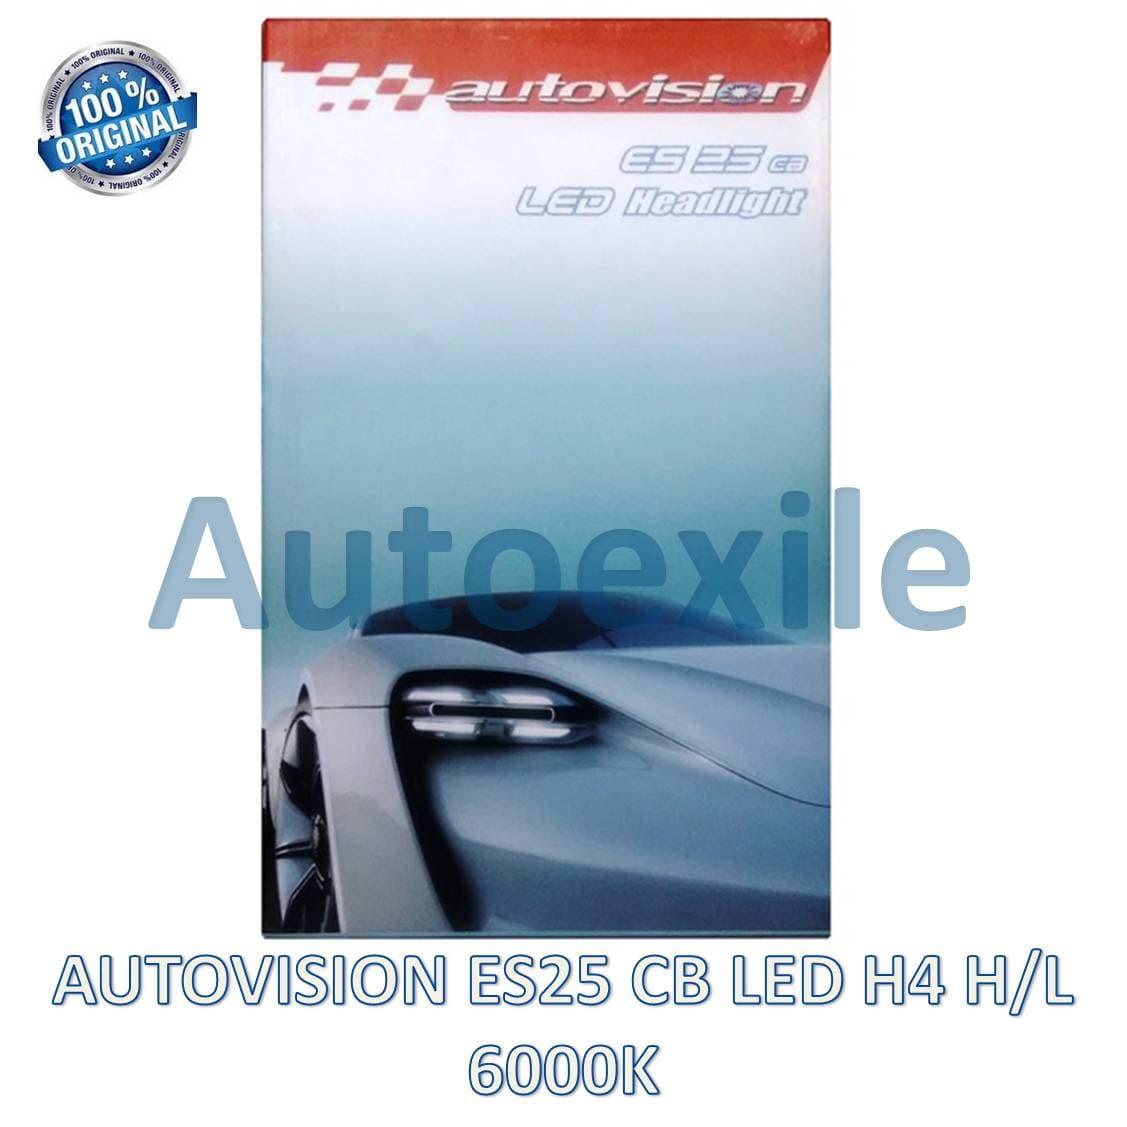 Autovision ES25 CB LED H4 H/L 25/50W 6000K Putih Epistar ES-25 Lampu Mobil